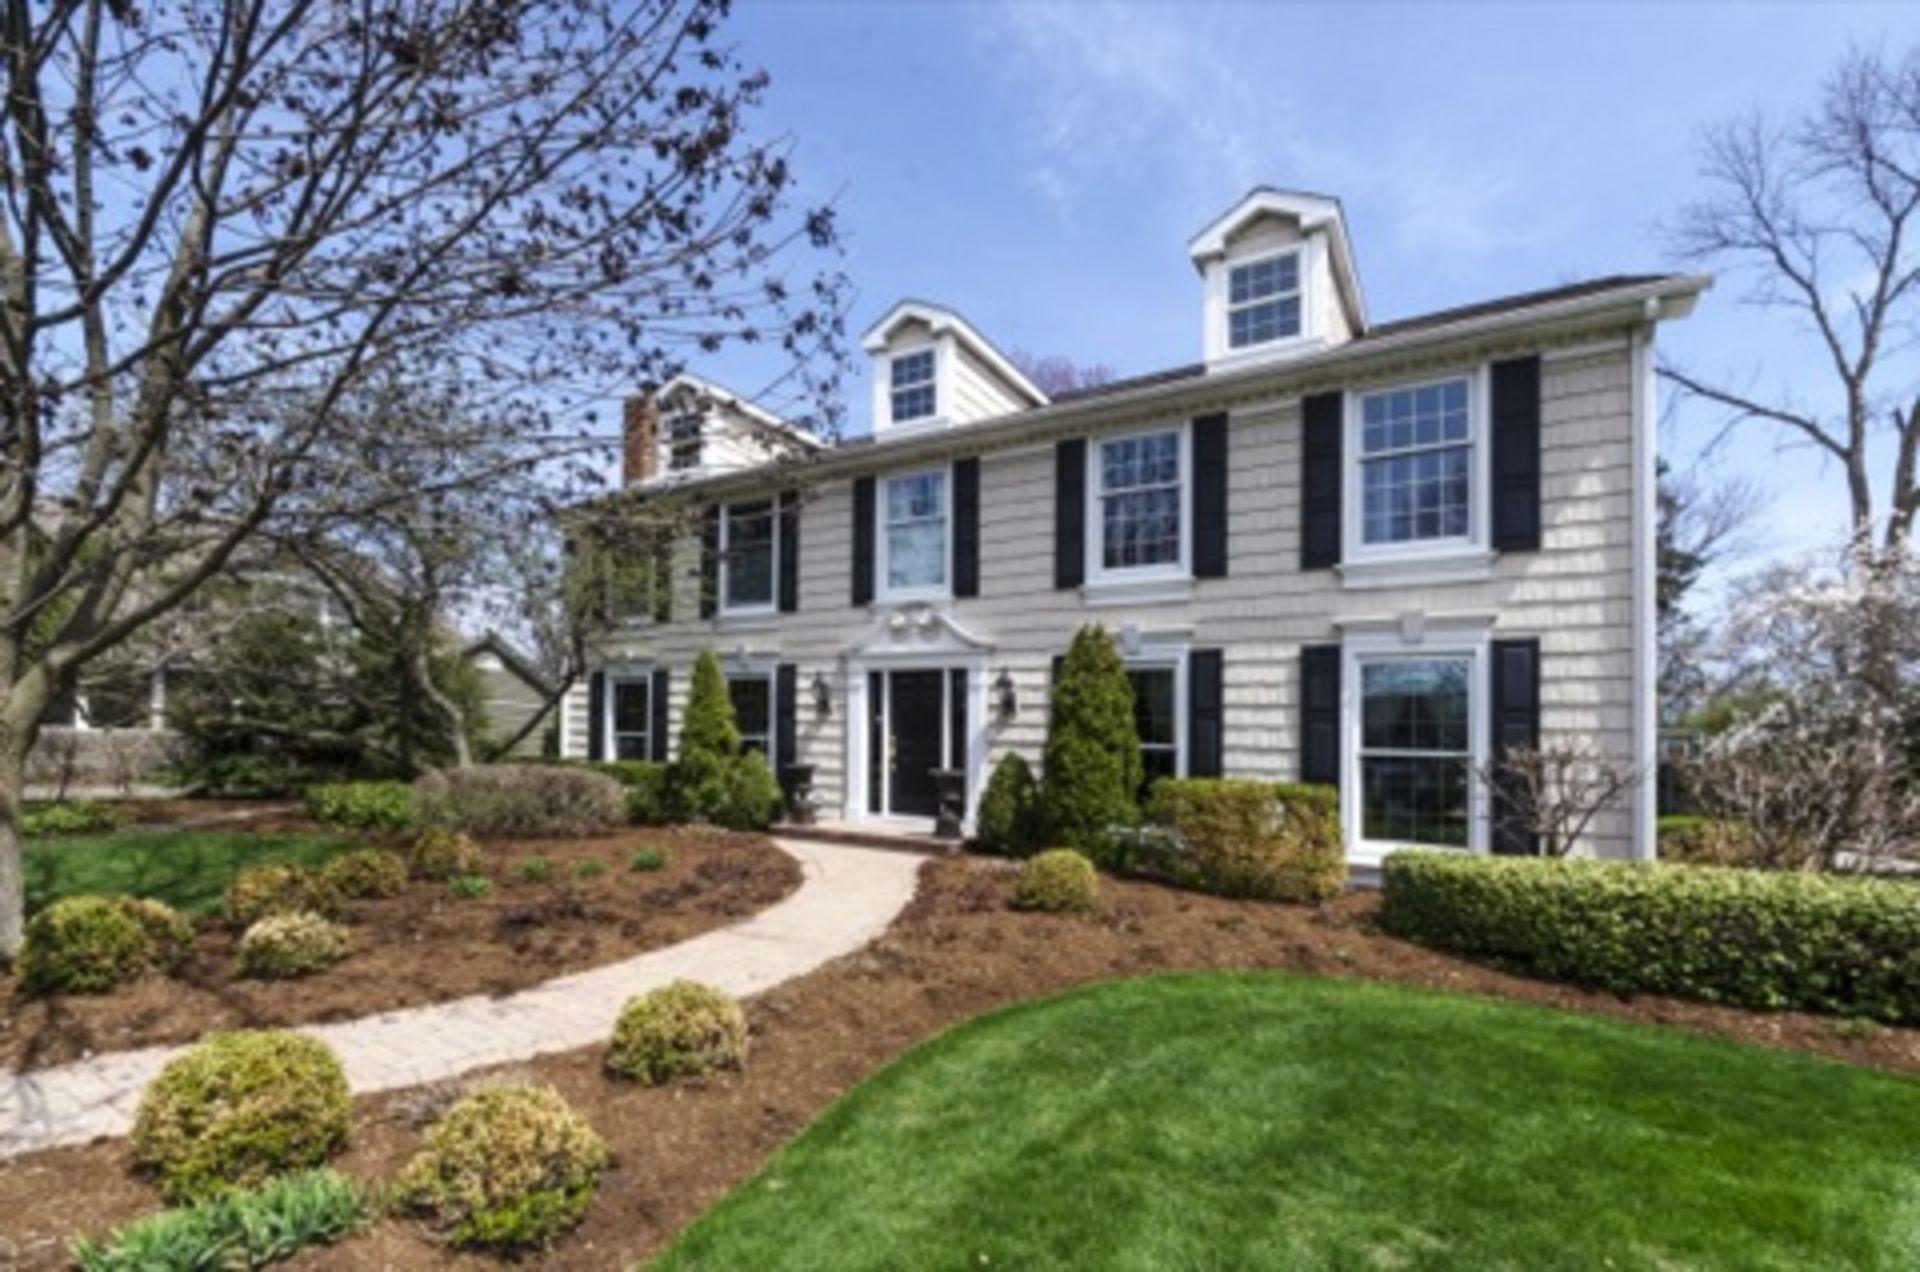 Wheaton Real Estate Update